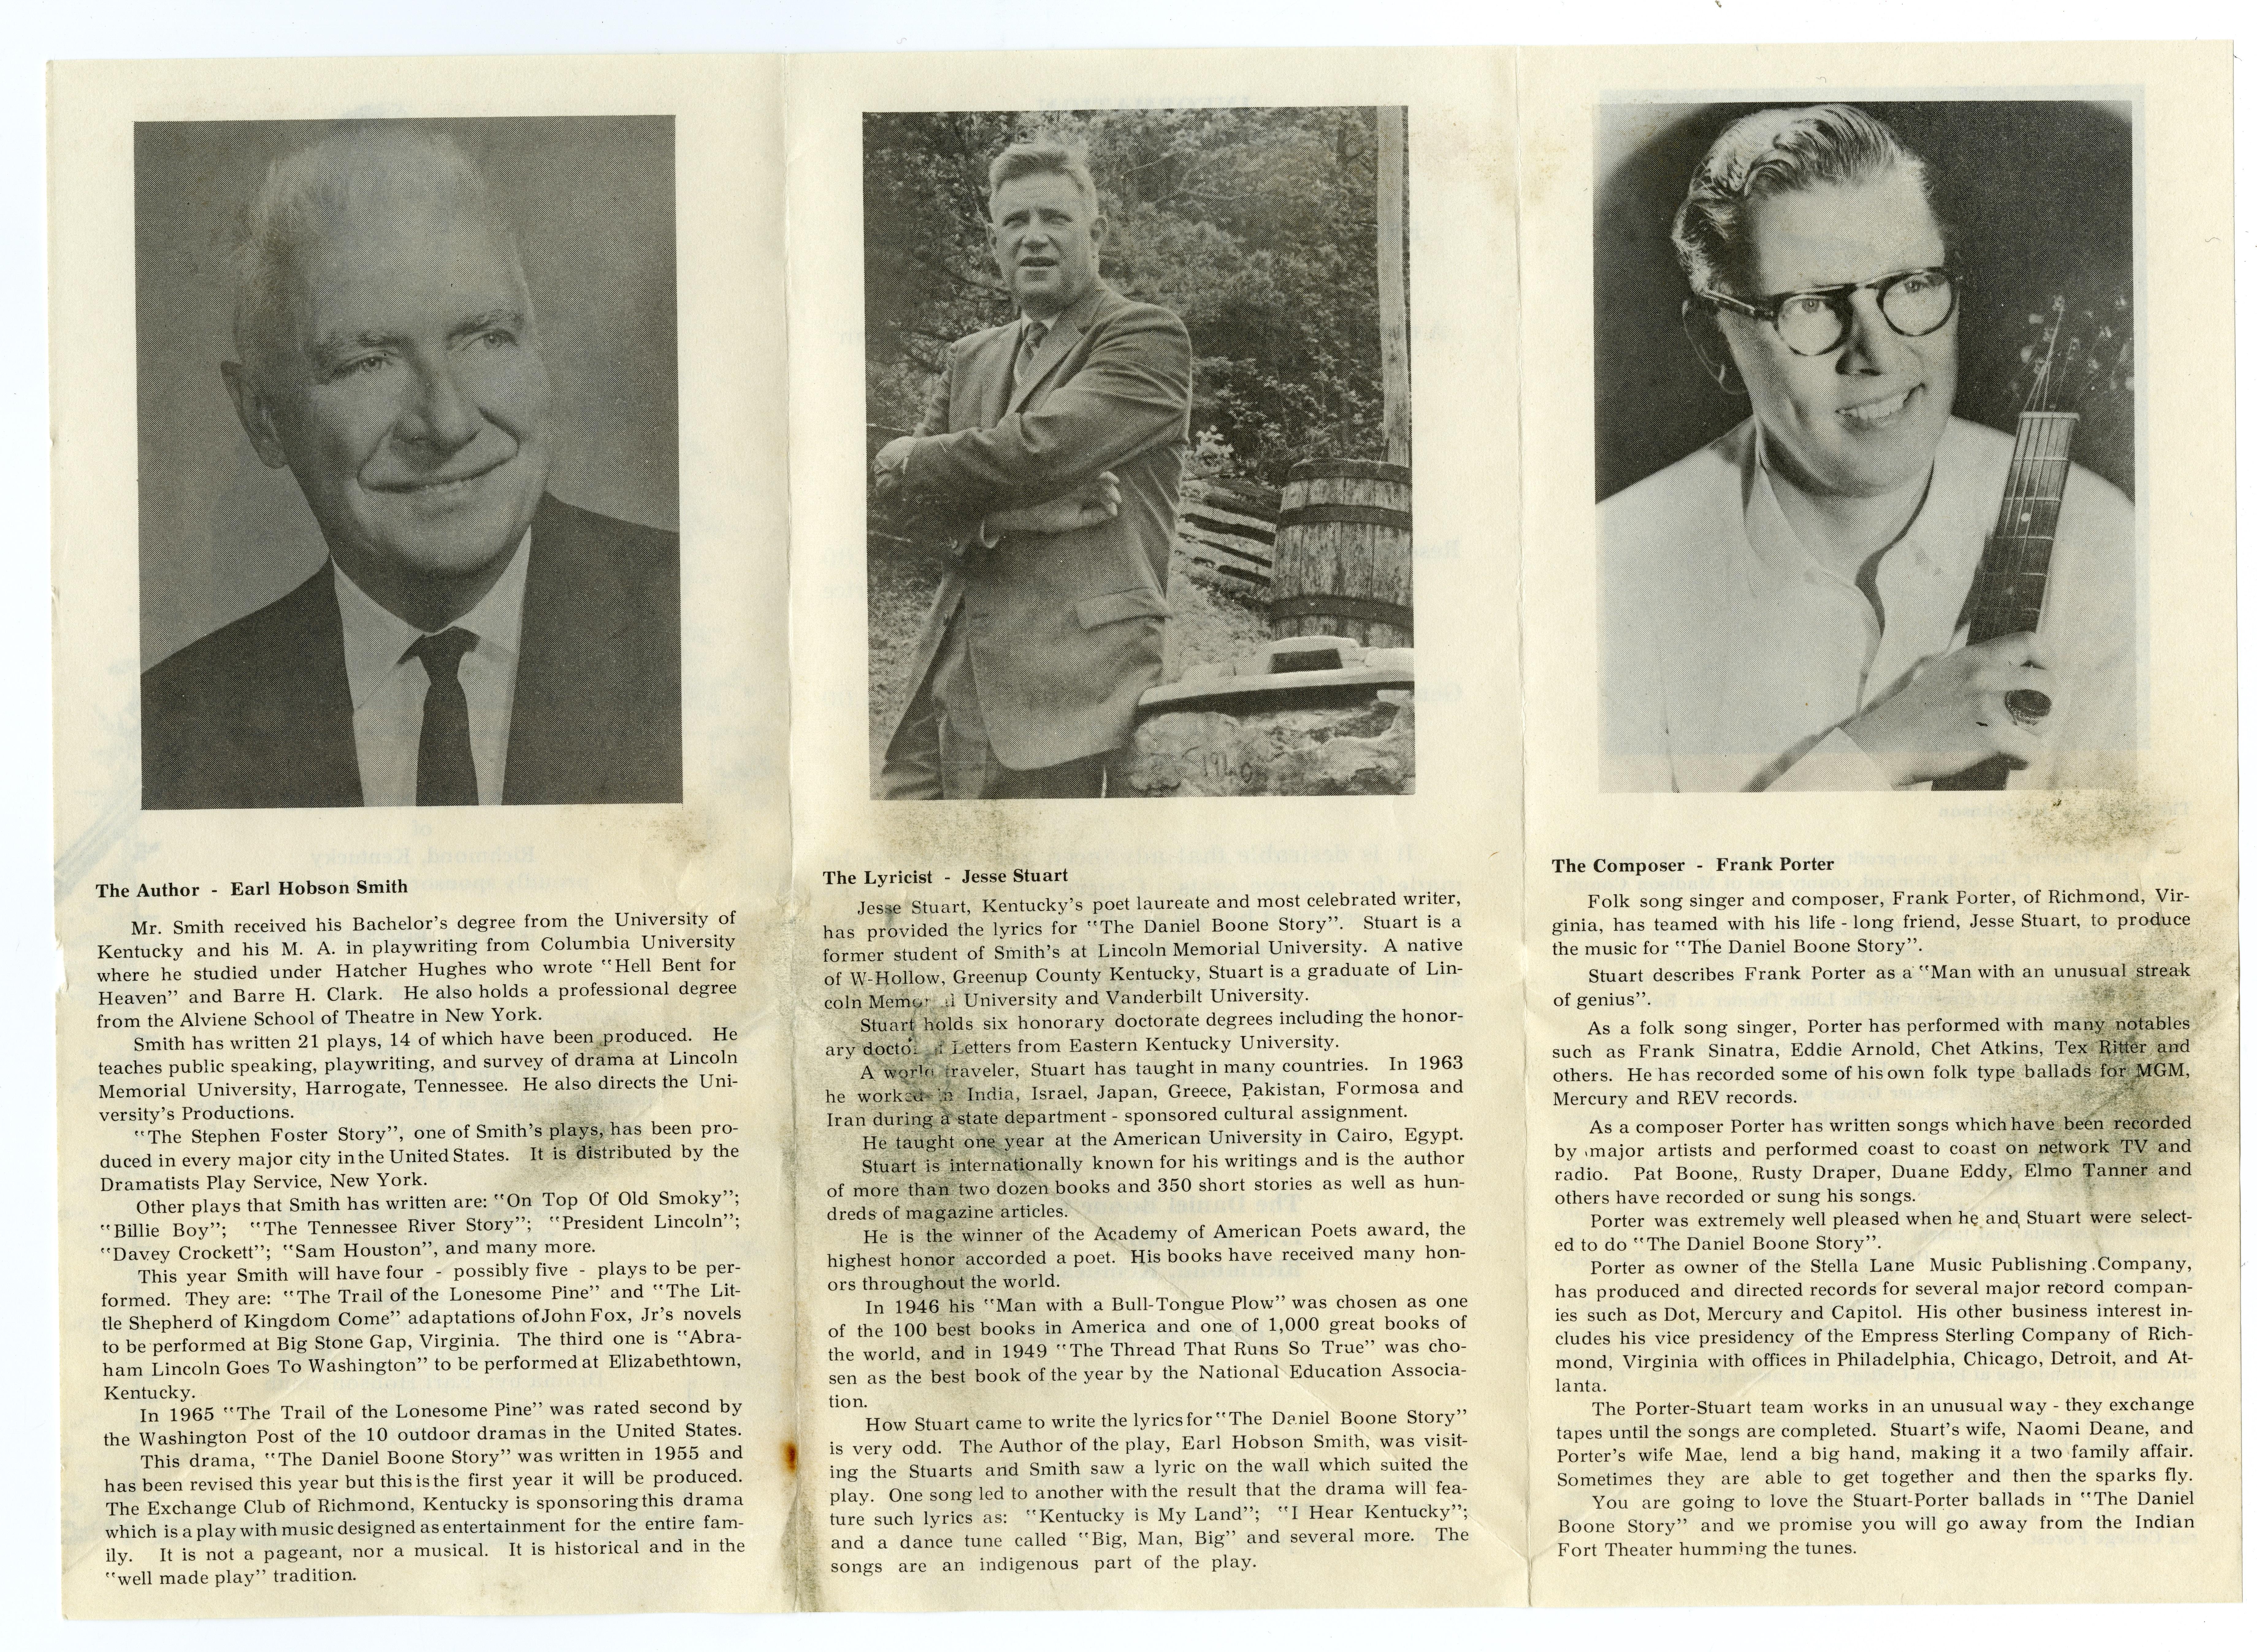 Daniel Boone Story program, Side 2